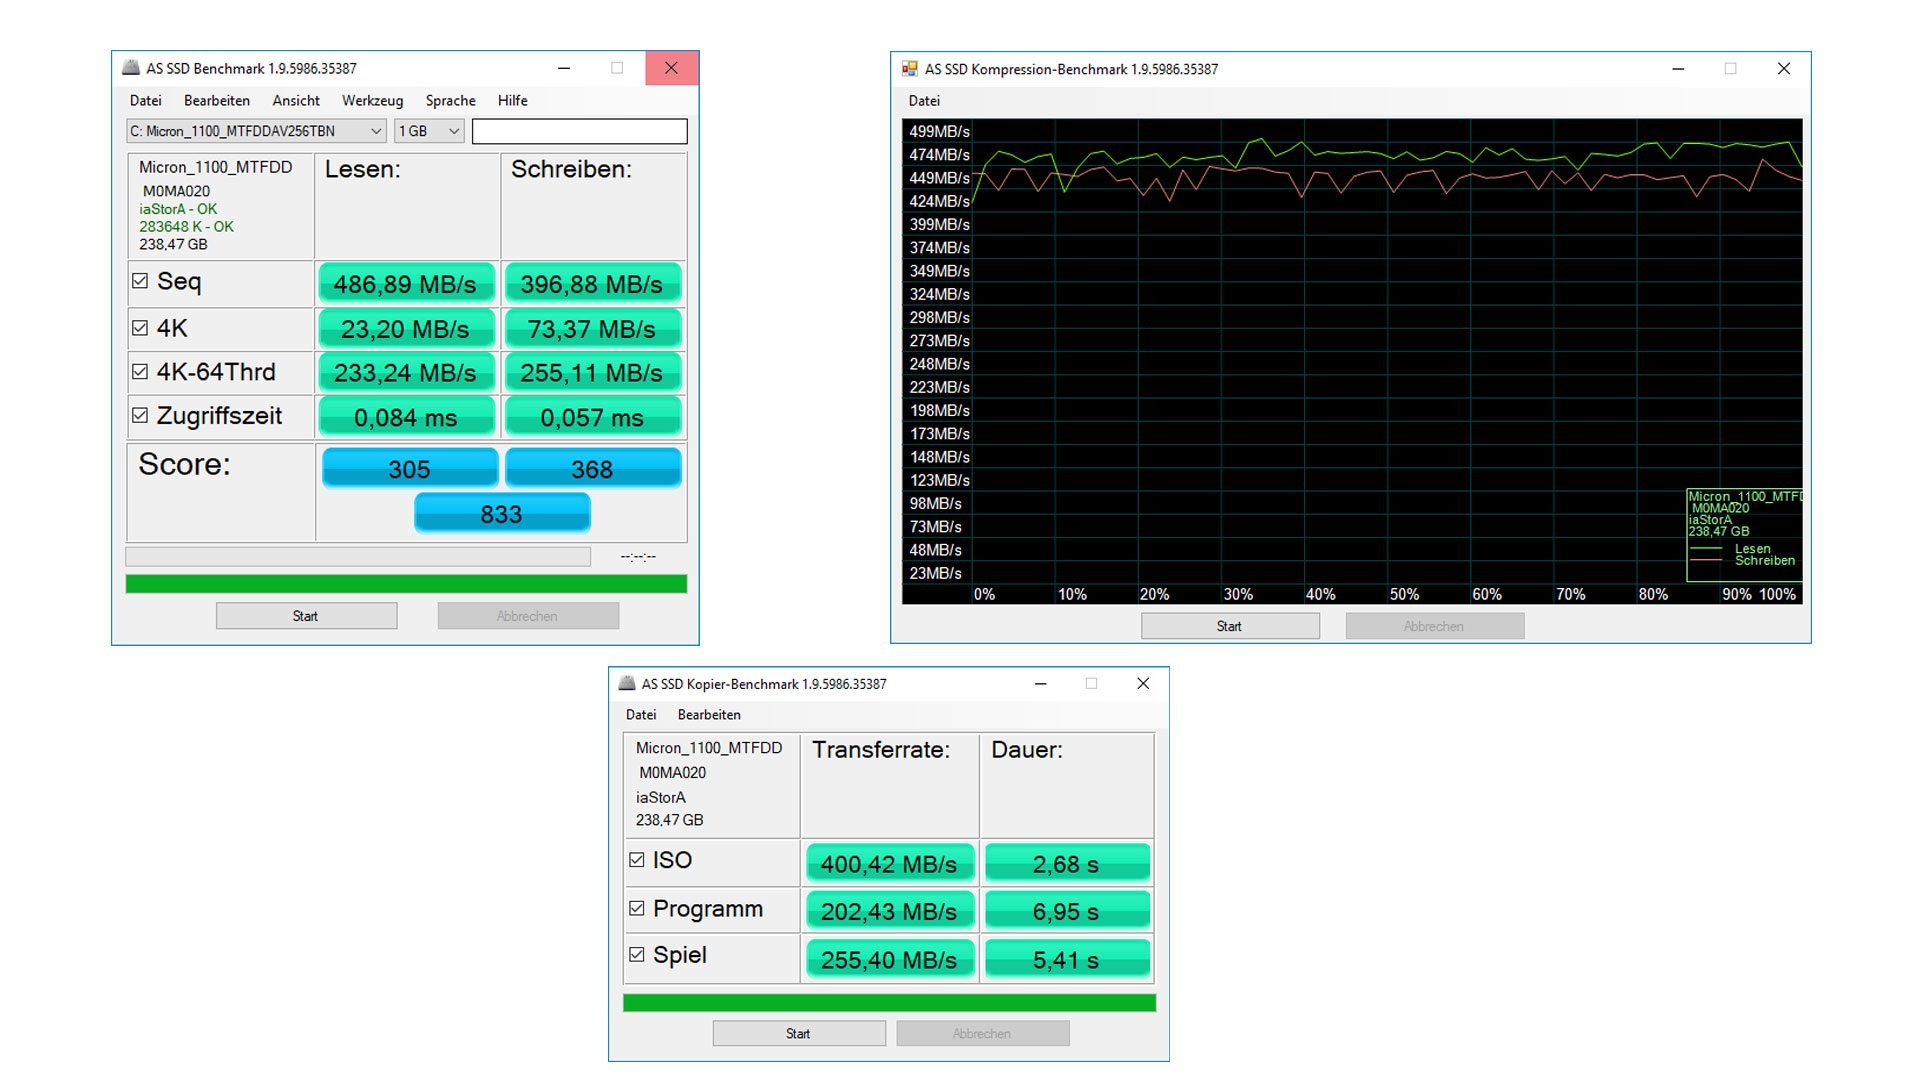 Asus-ROG-Strix-GL702VM-BA323T_Benchmark-5